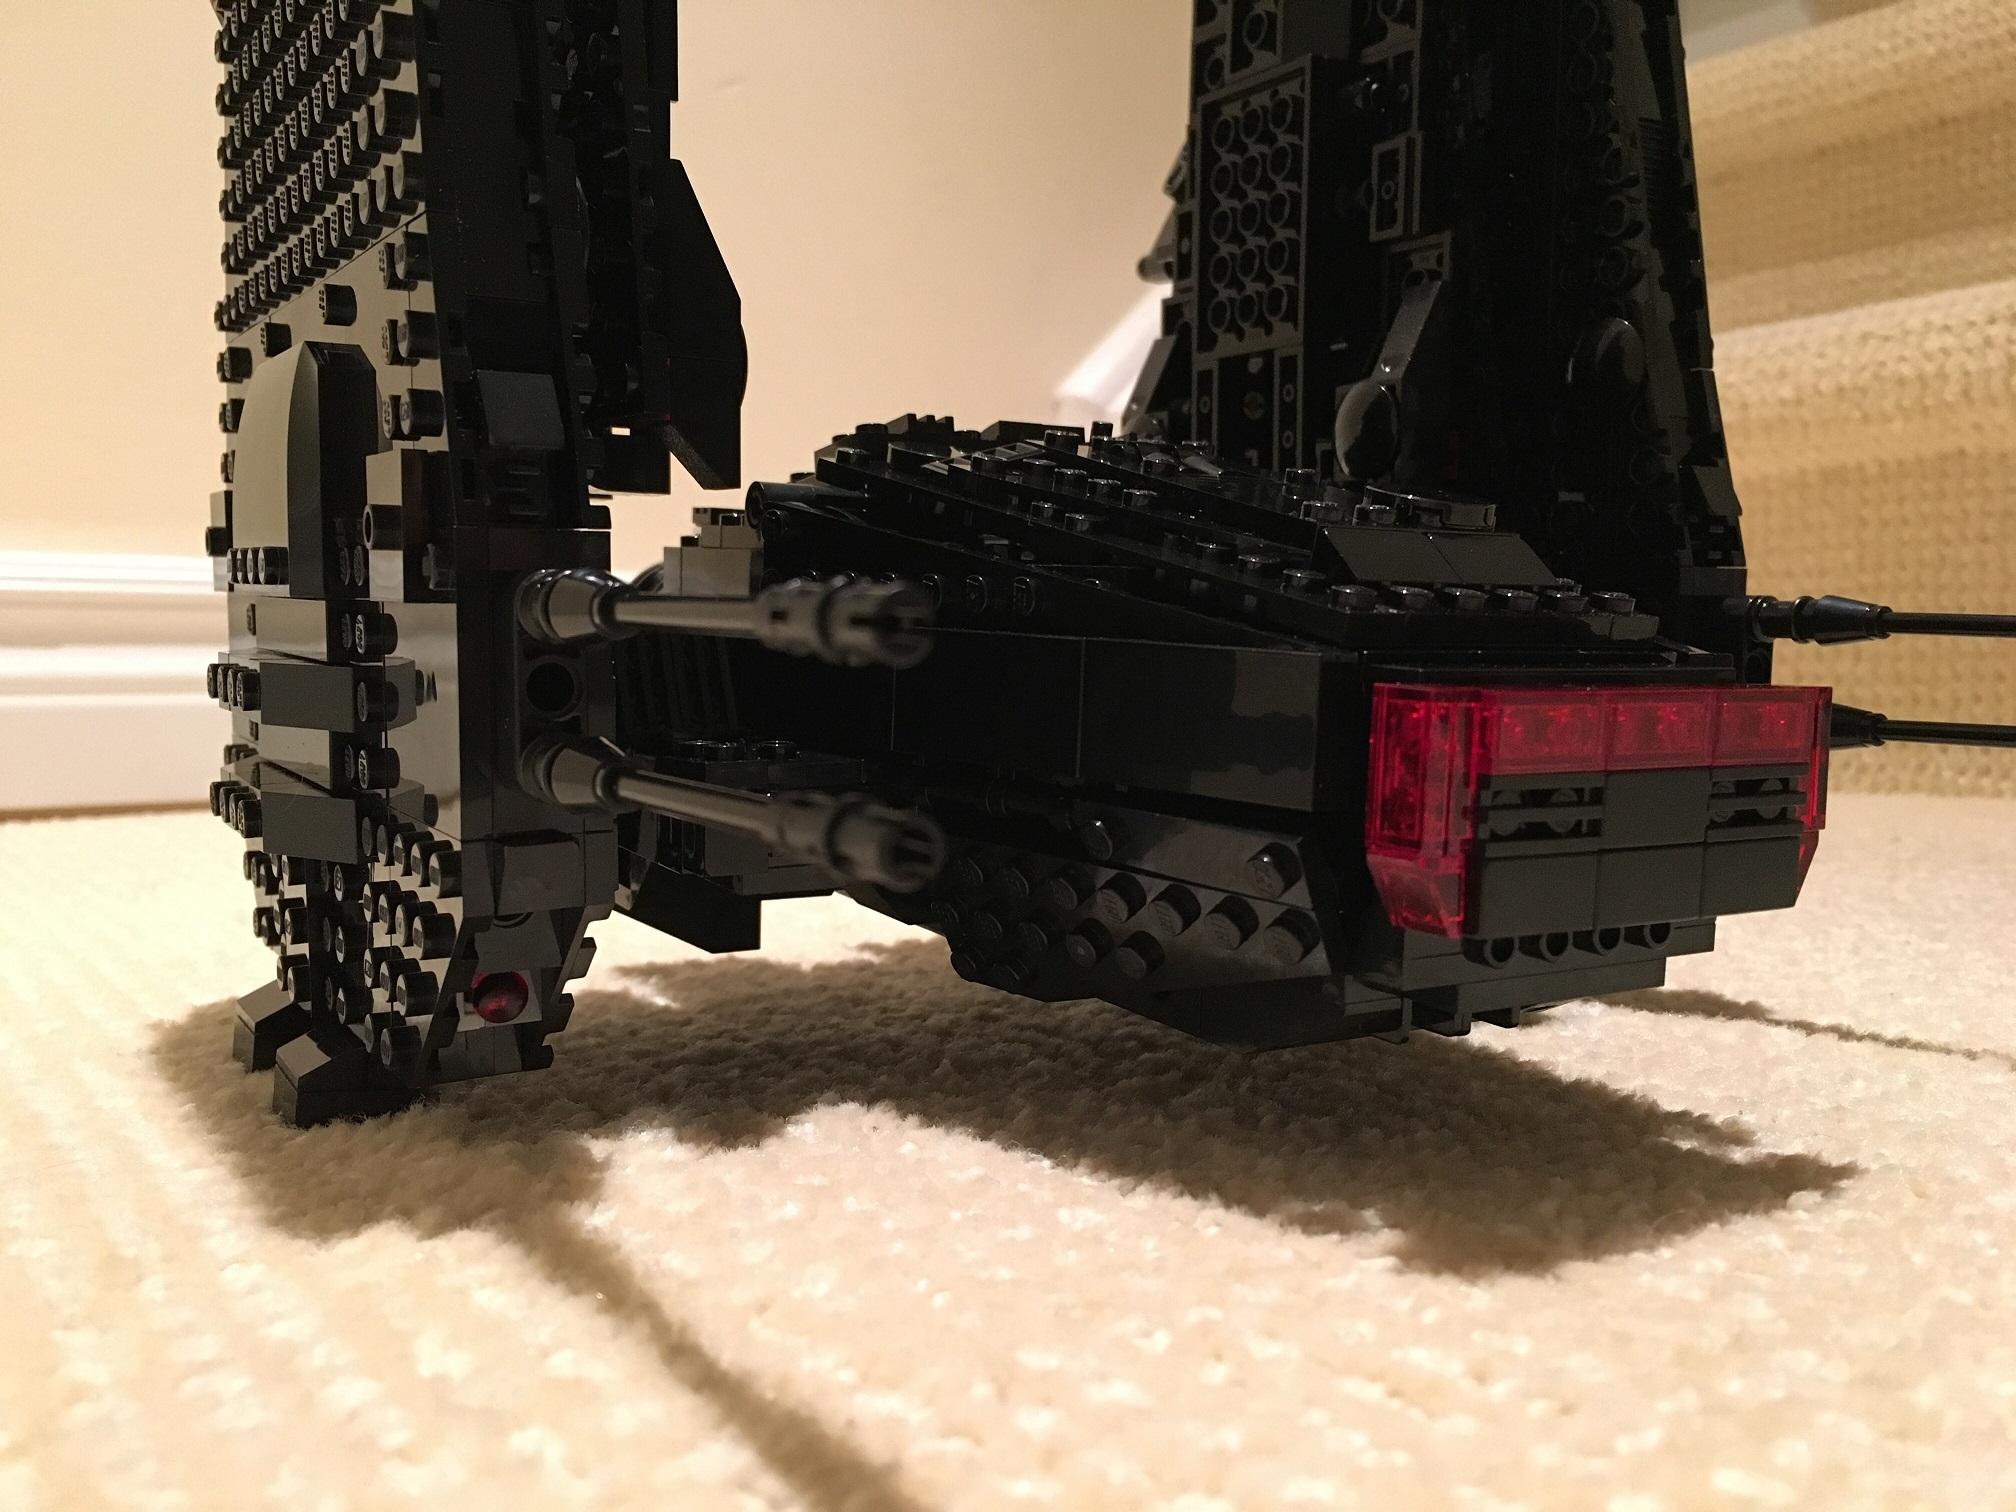 REVIEW: 75104 Kylo Ren's Command Shuttle - LEGO Star Wars ... | 1512x2016